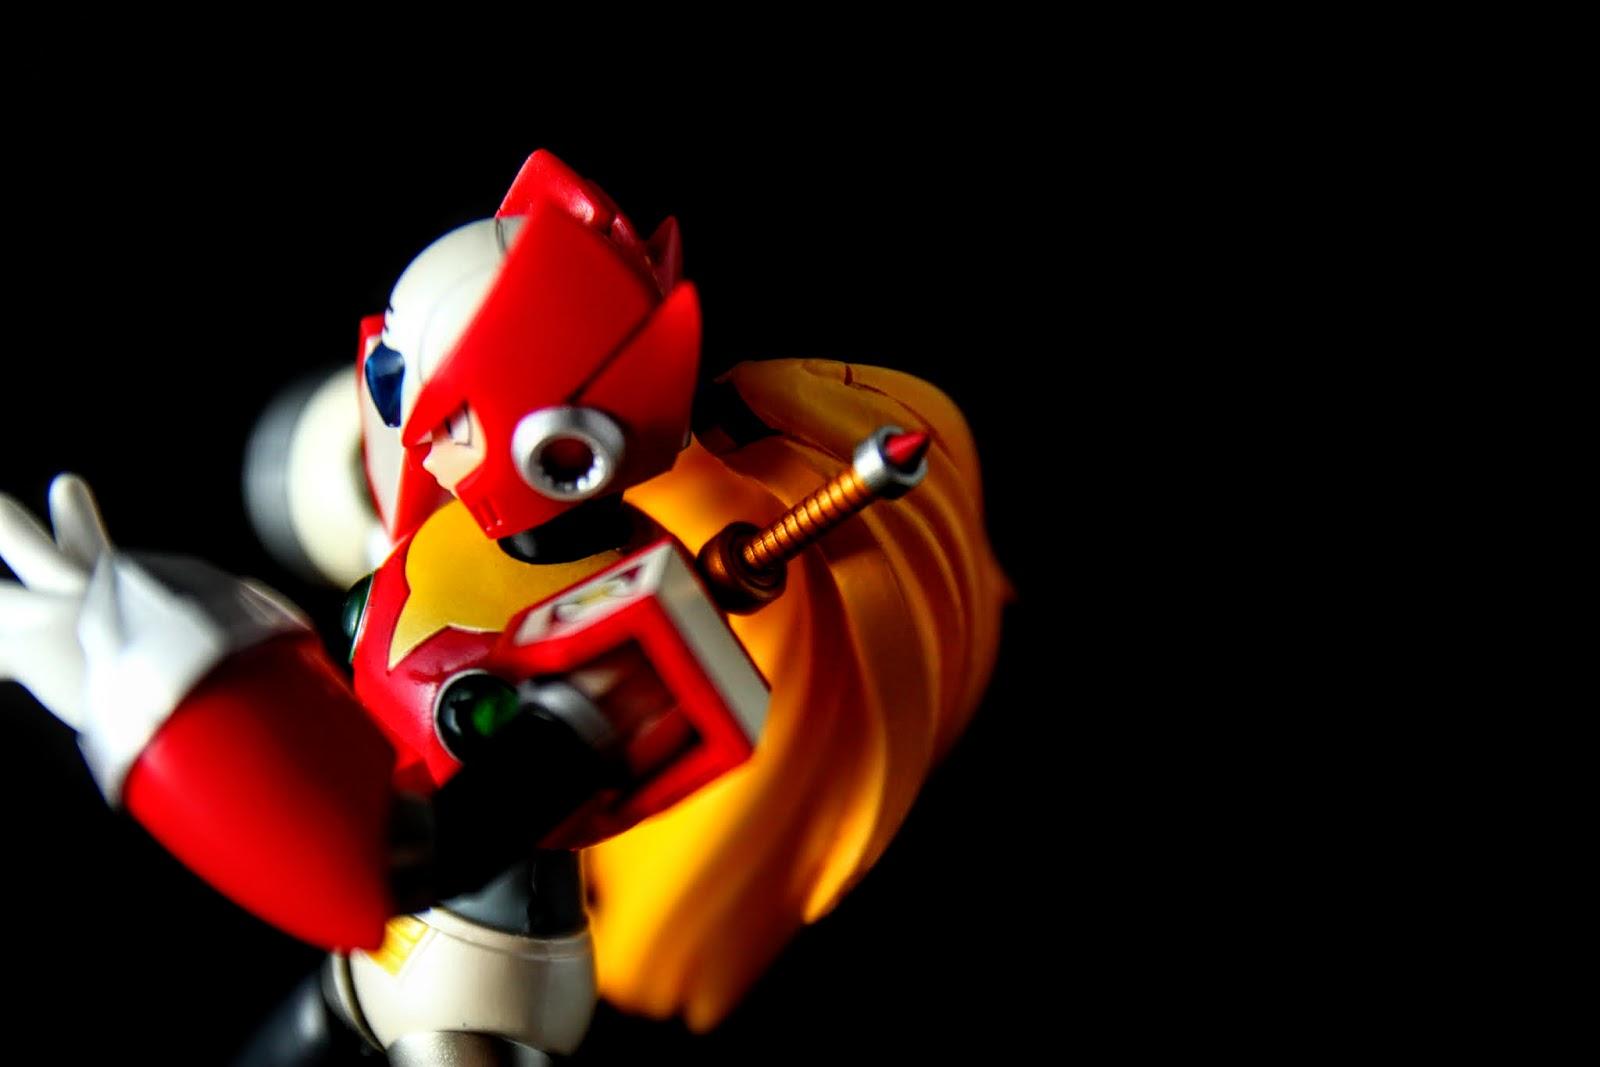 ZERO最大的特色還是在他的光束刀